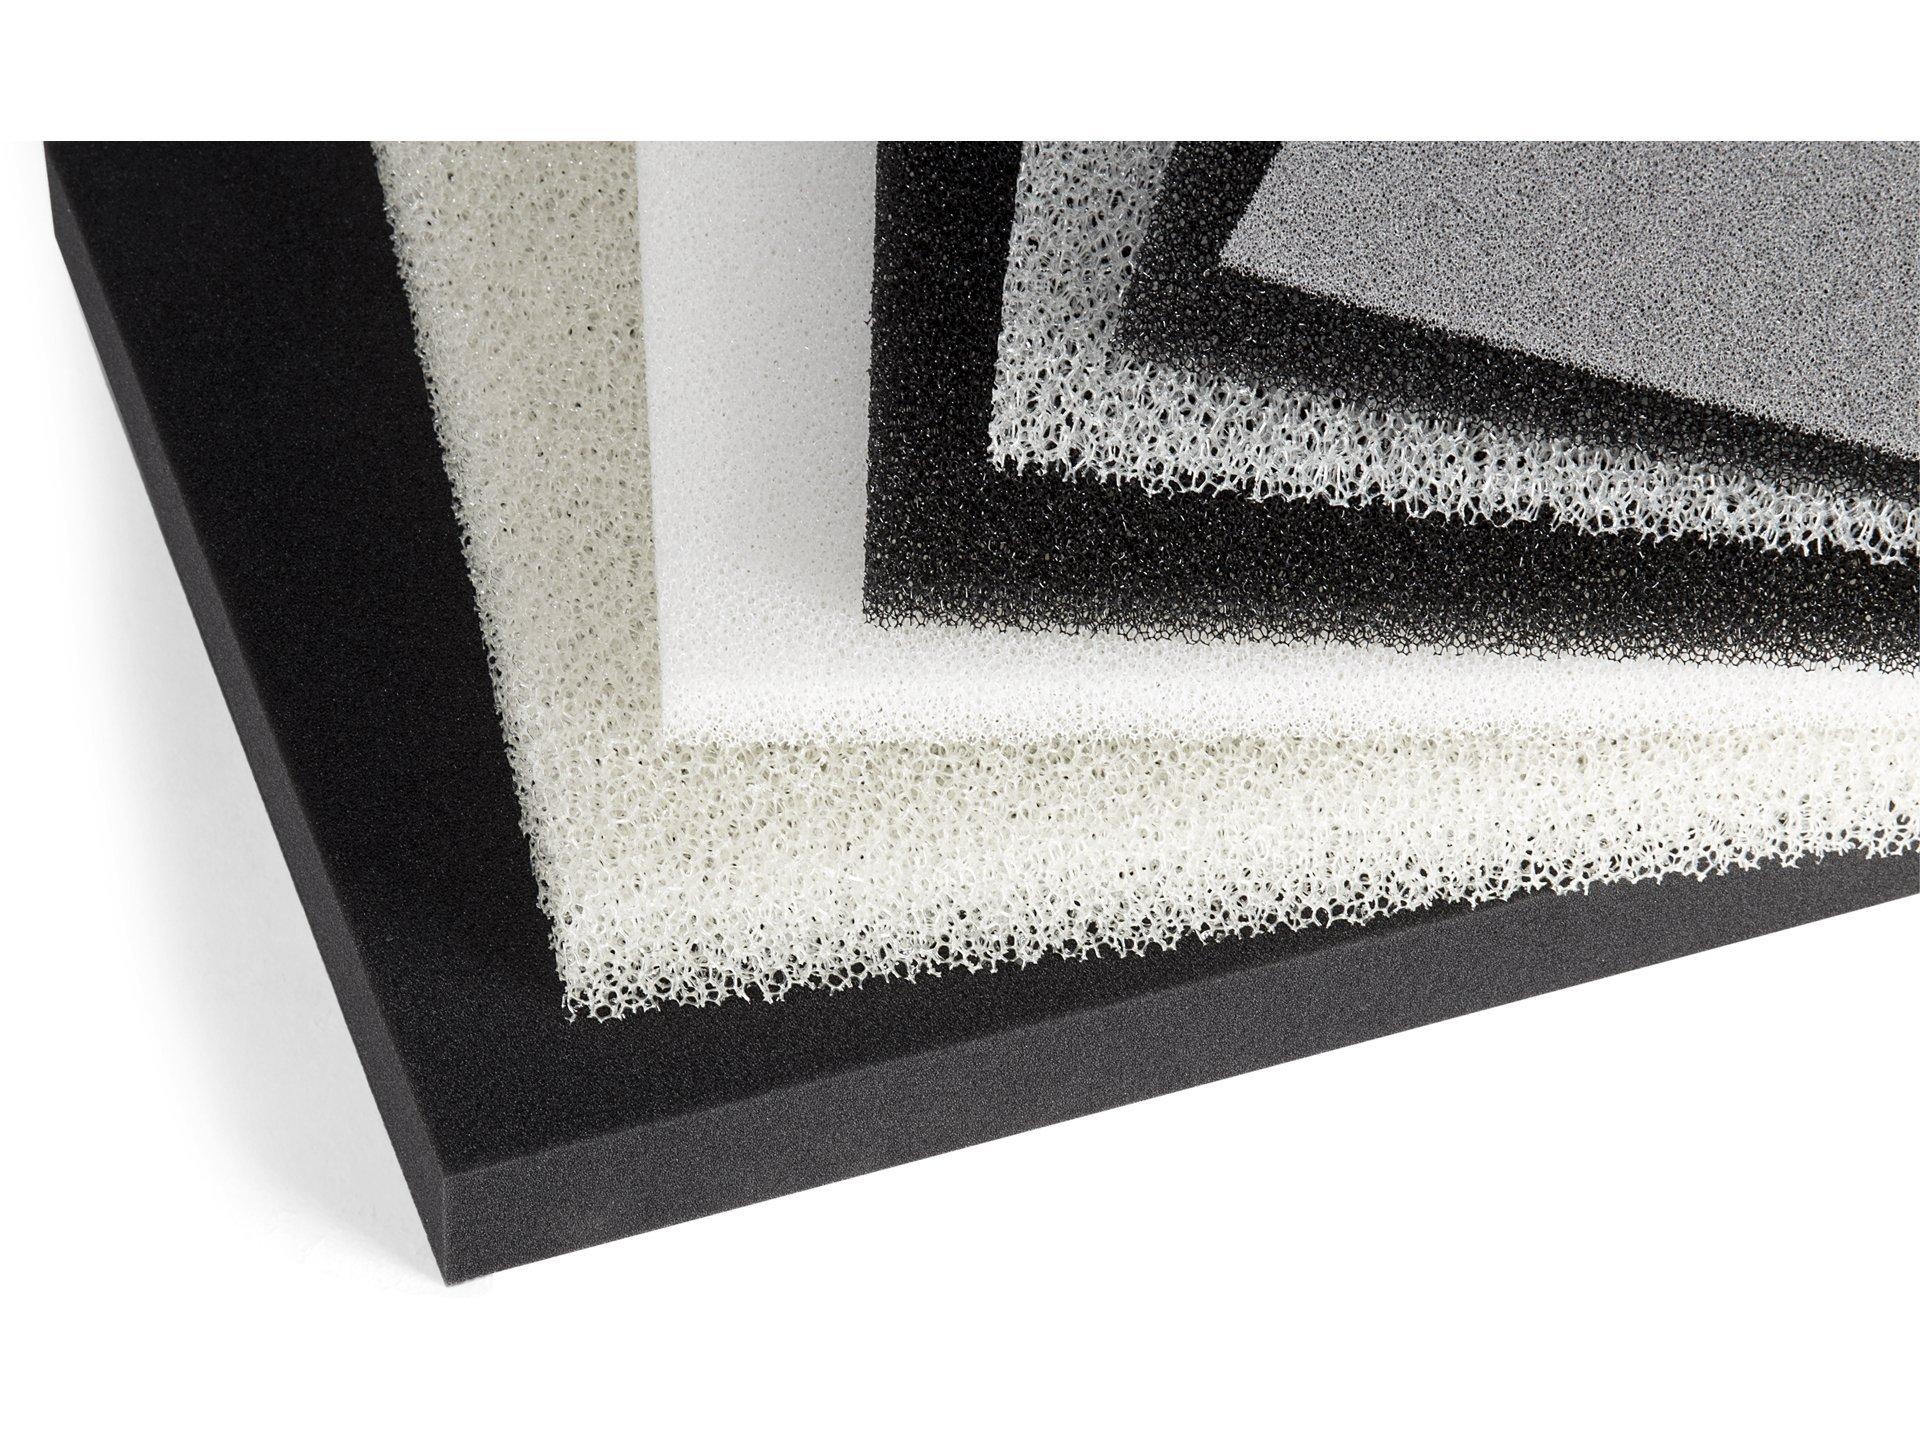 polyurethan filterschaum pflanzenschaum kaufen modulor. Black Bedroom Furniture Sets. Home Design Ideas